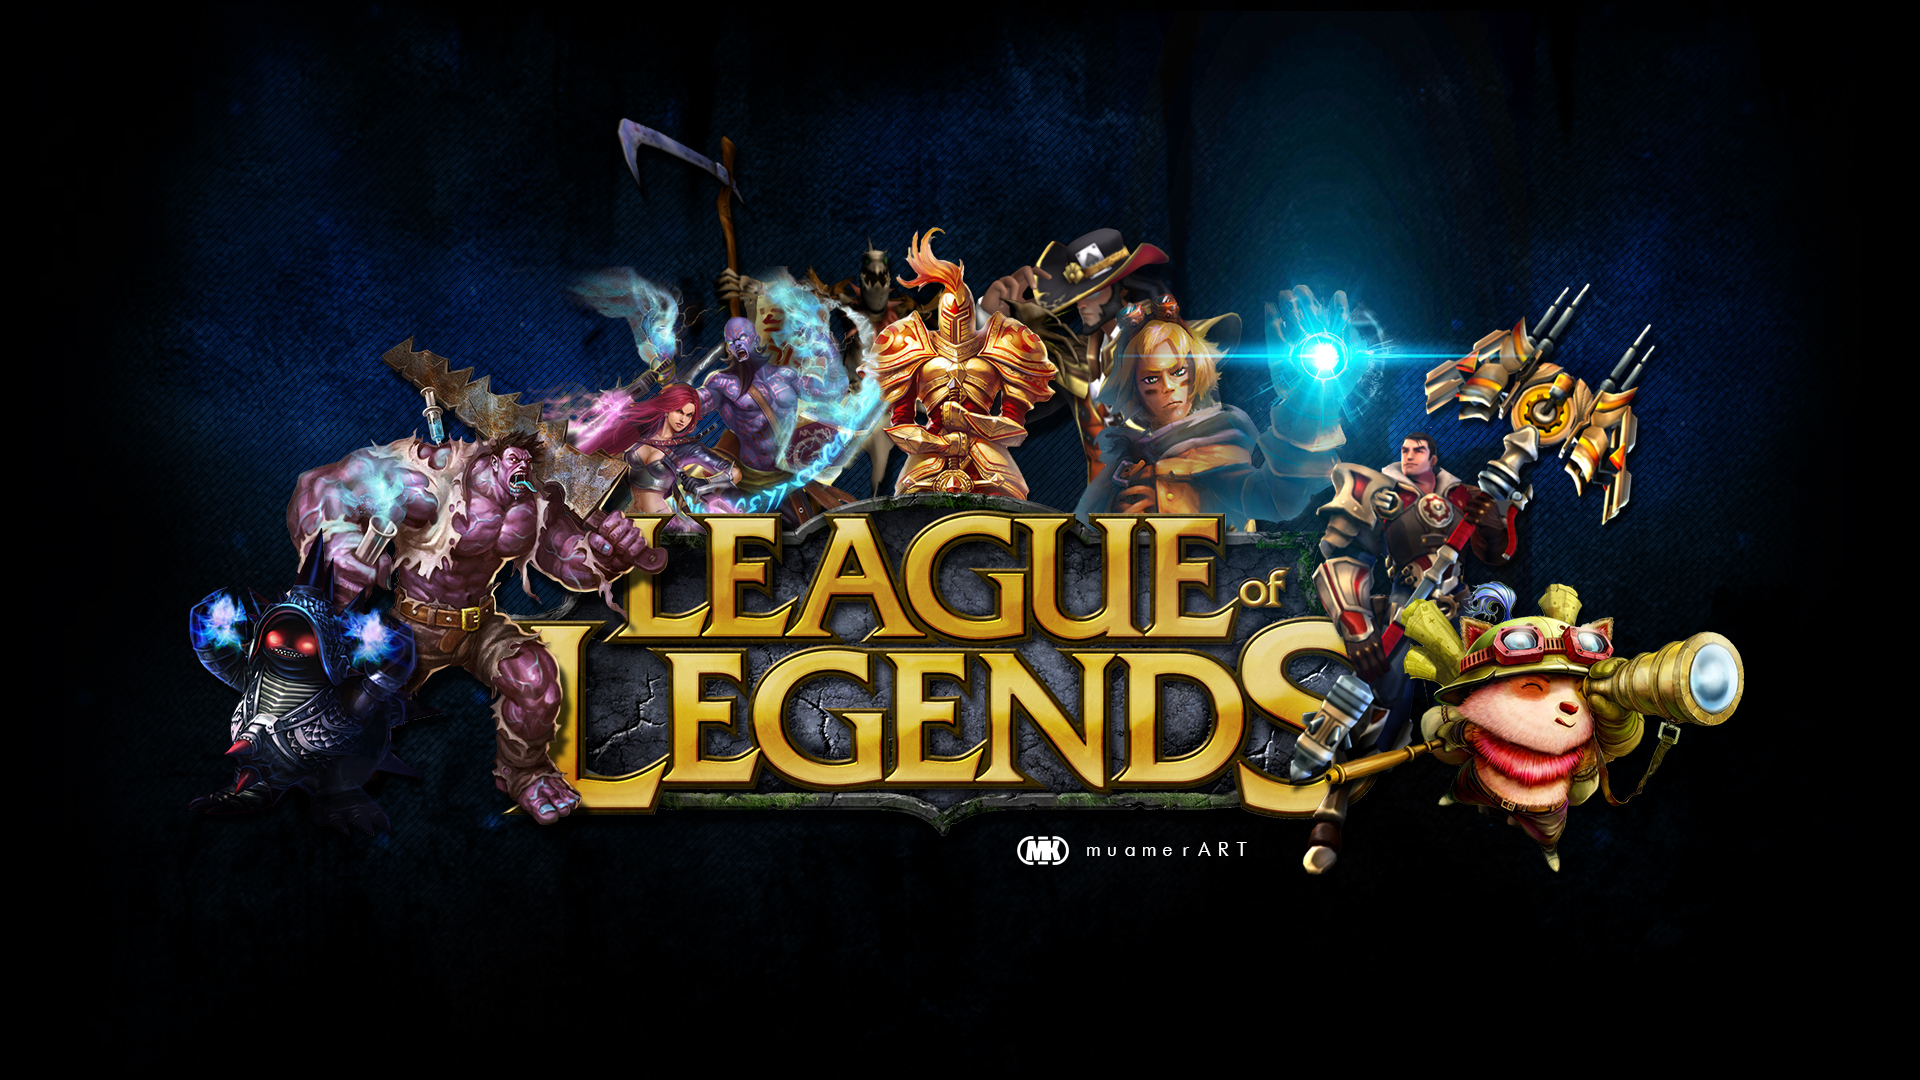 league of legends wallpaper - photo #41